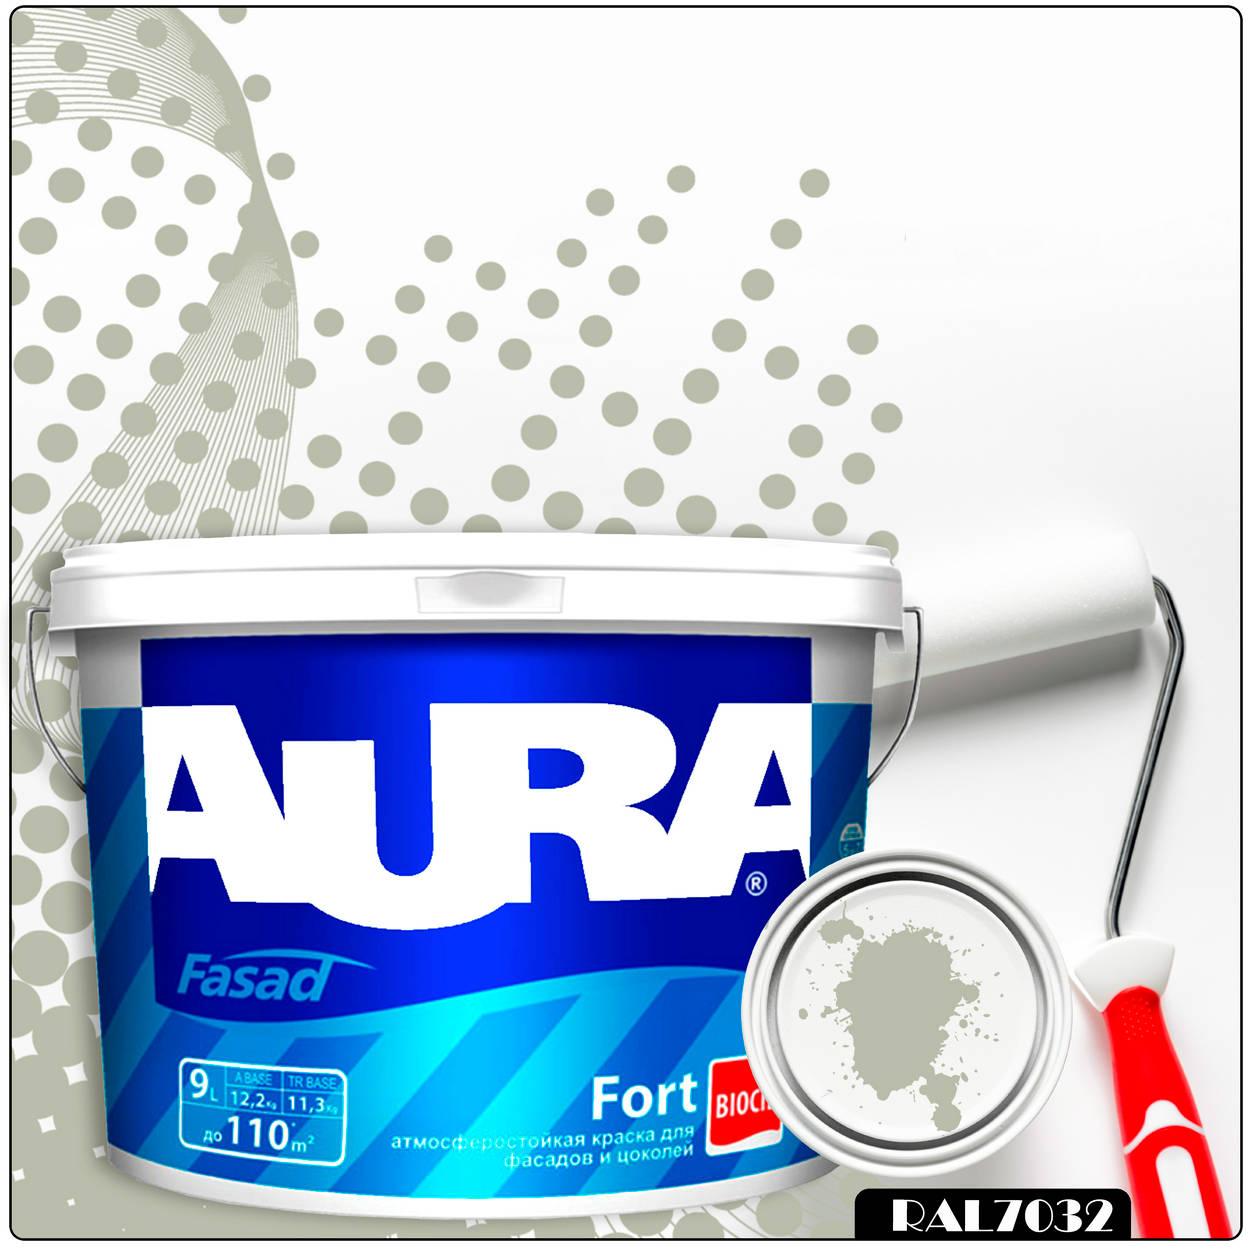 Фото 22 - Краска Aura Fasad Fort, RAL 7032 Серая галька, латексная, матовая, для фасада и цоколей, 9л, Аура.